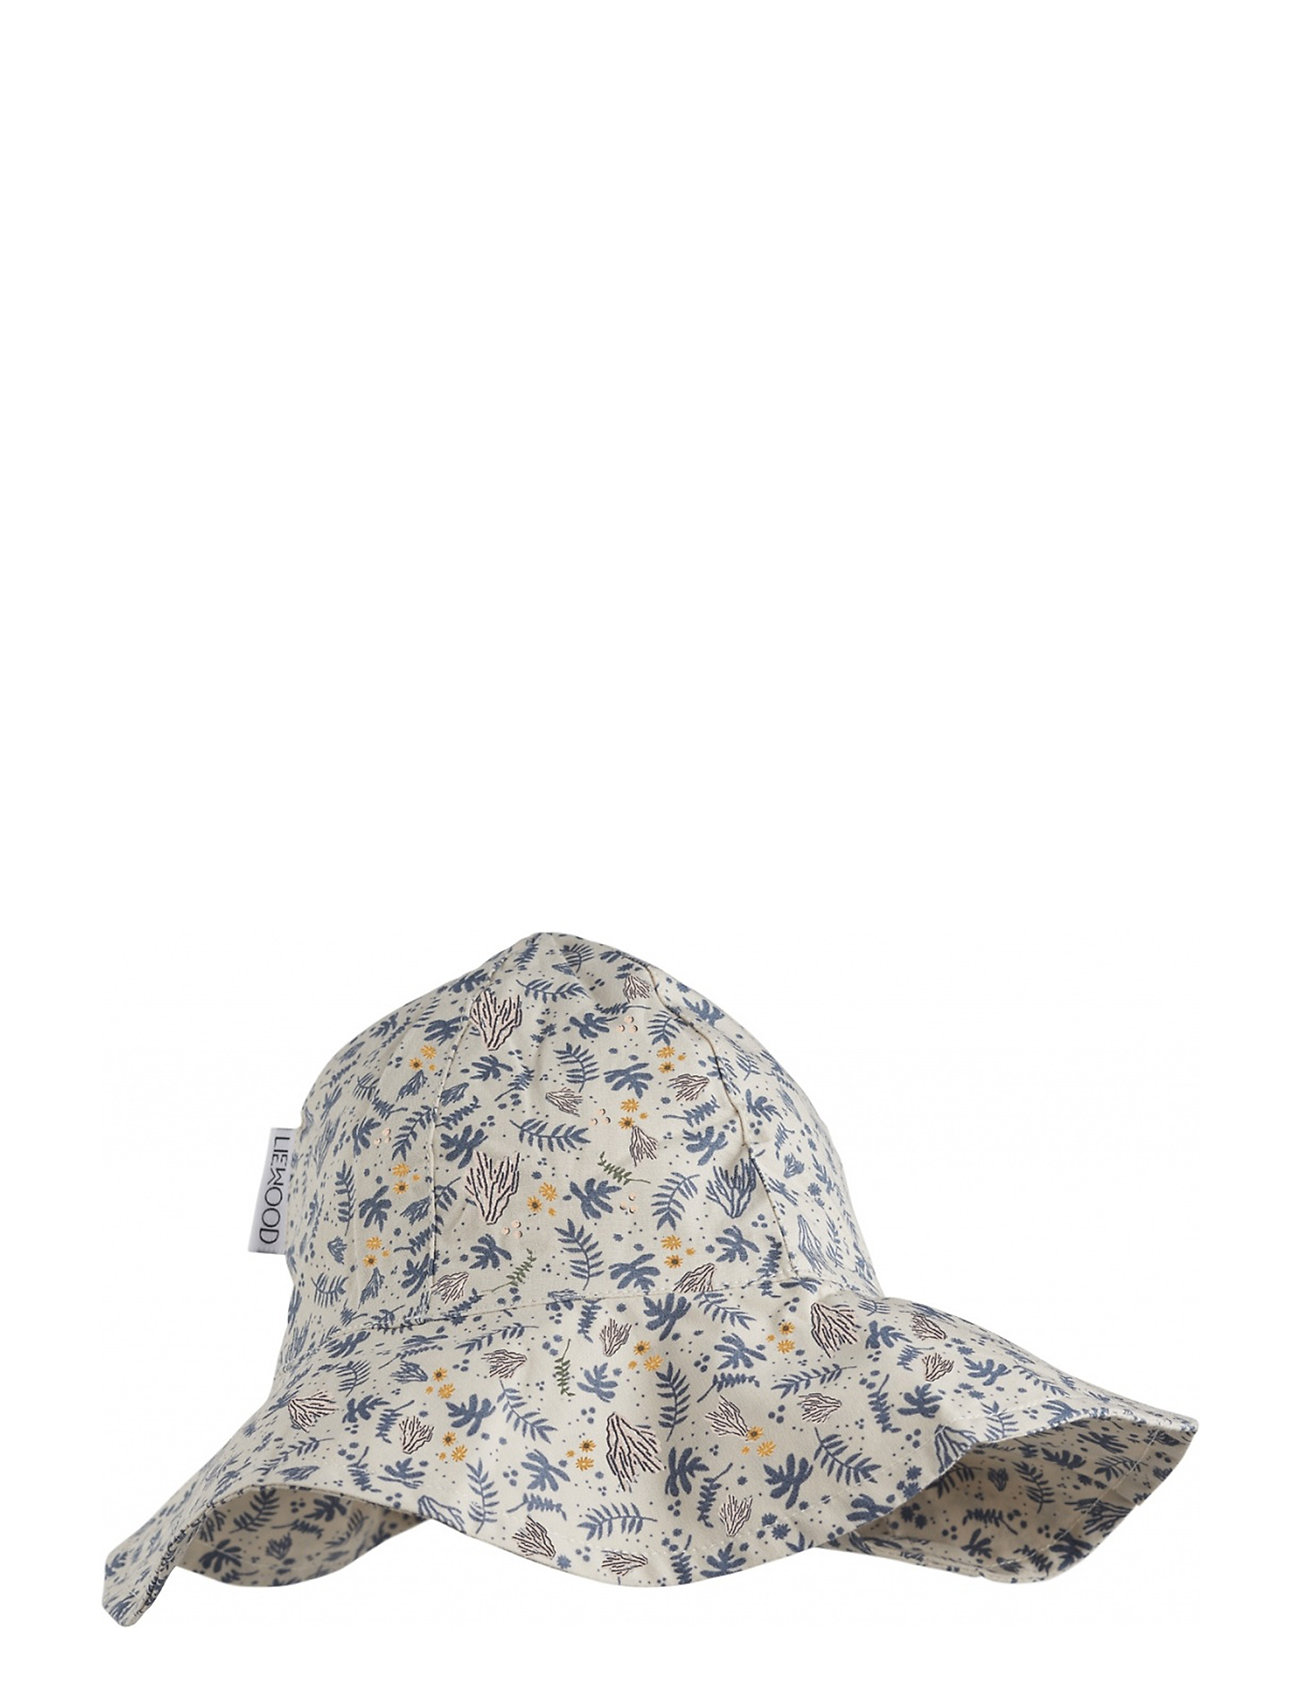 Liewood Amelia sun hat - CORAL FLORAL/MIX